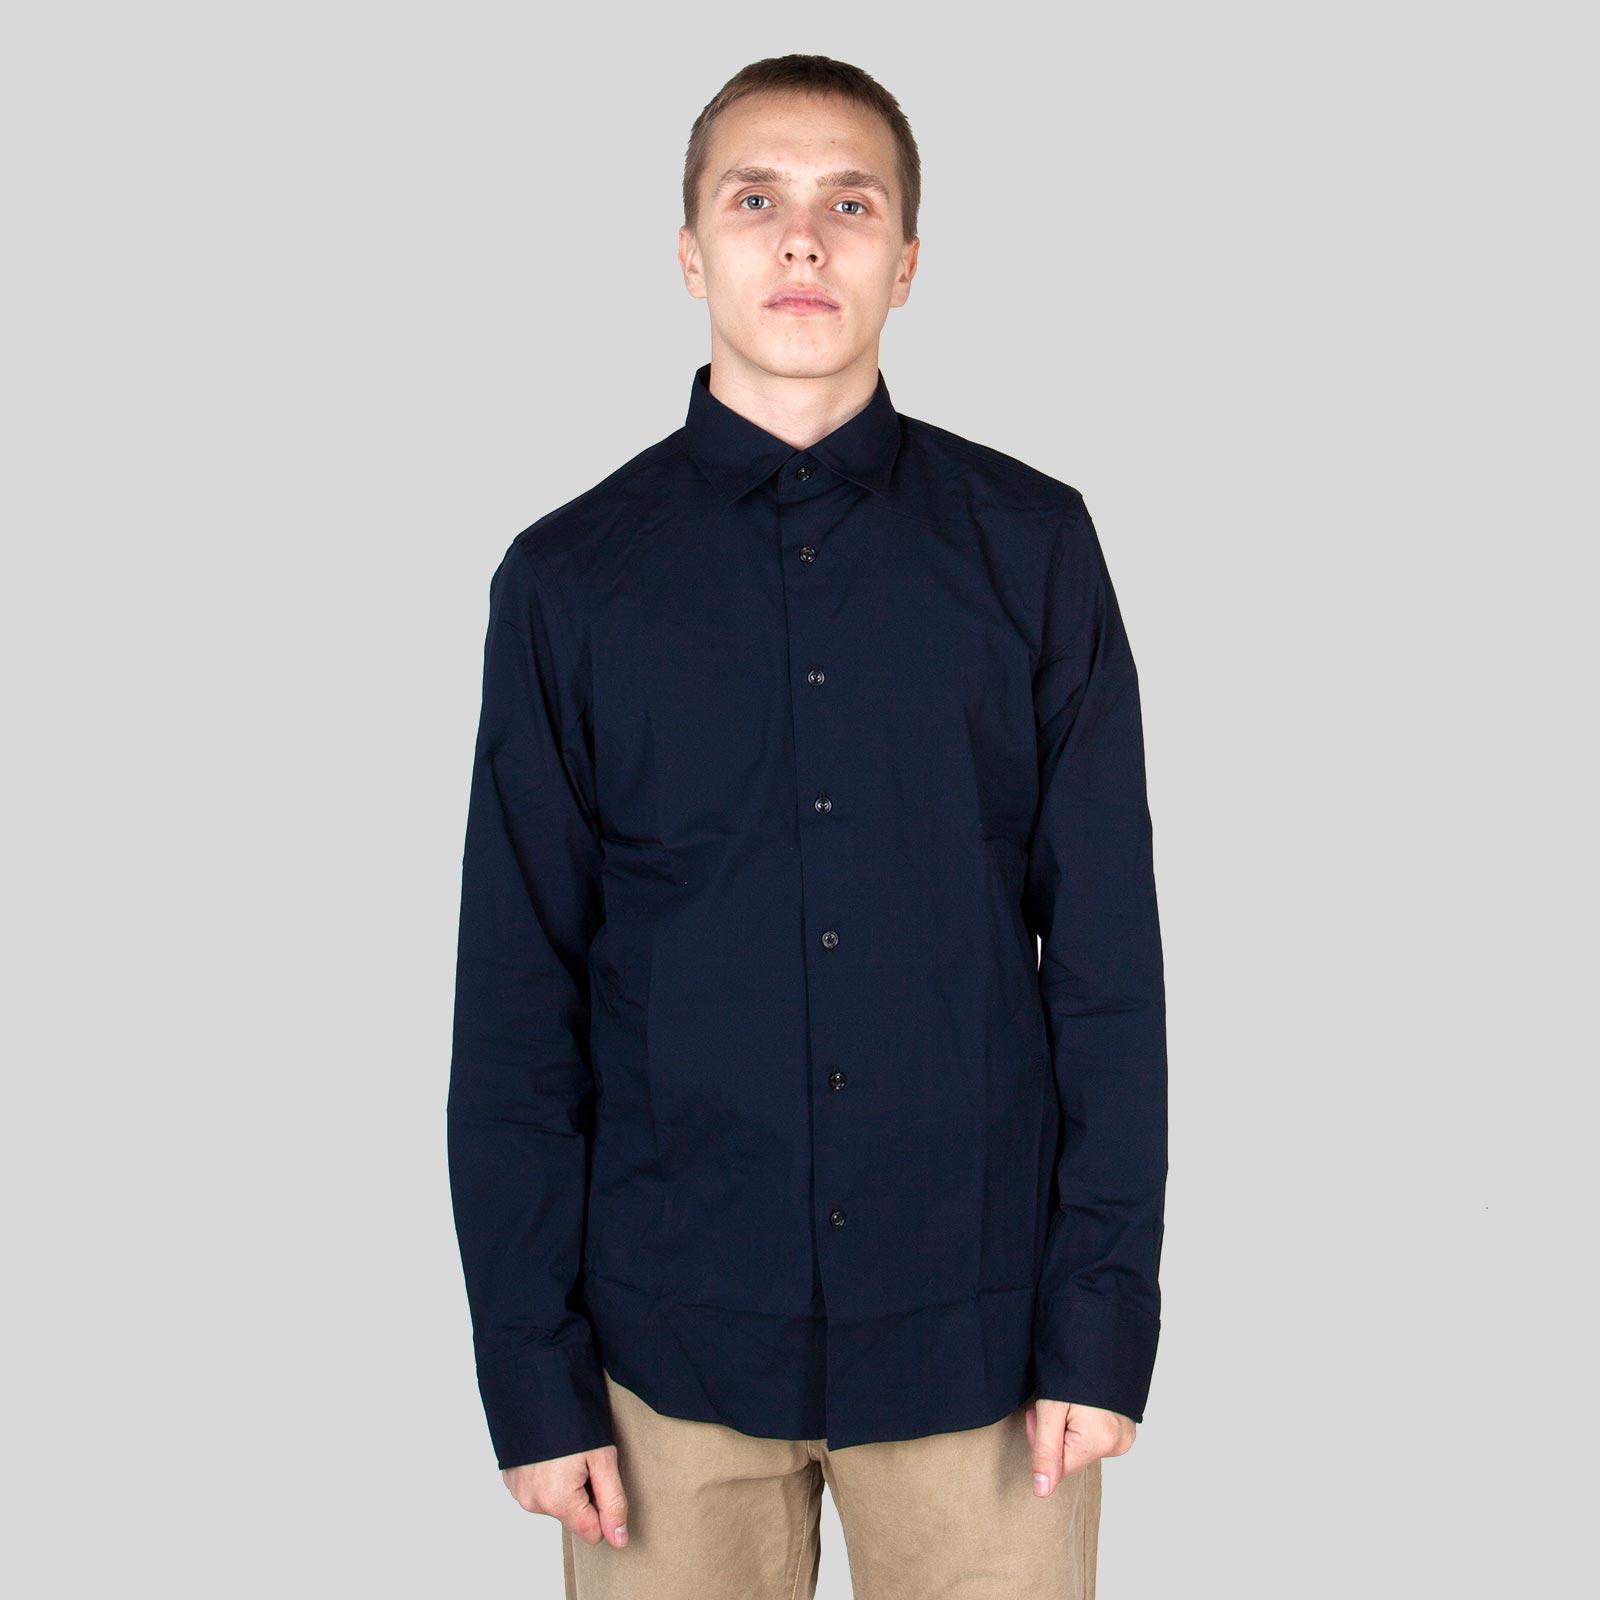 c1170fa445fa Hionidis Μπλε Core Super Slim Dark Blue Shirt G-STAR